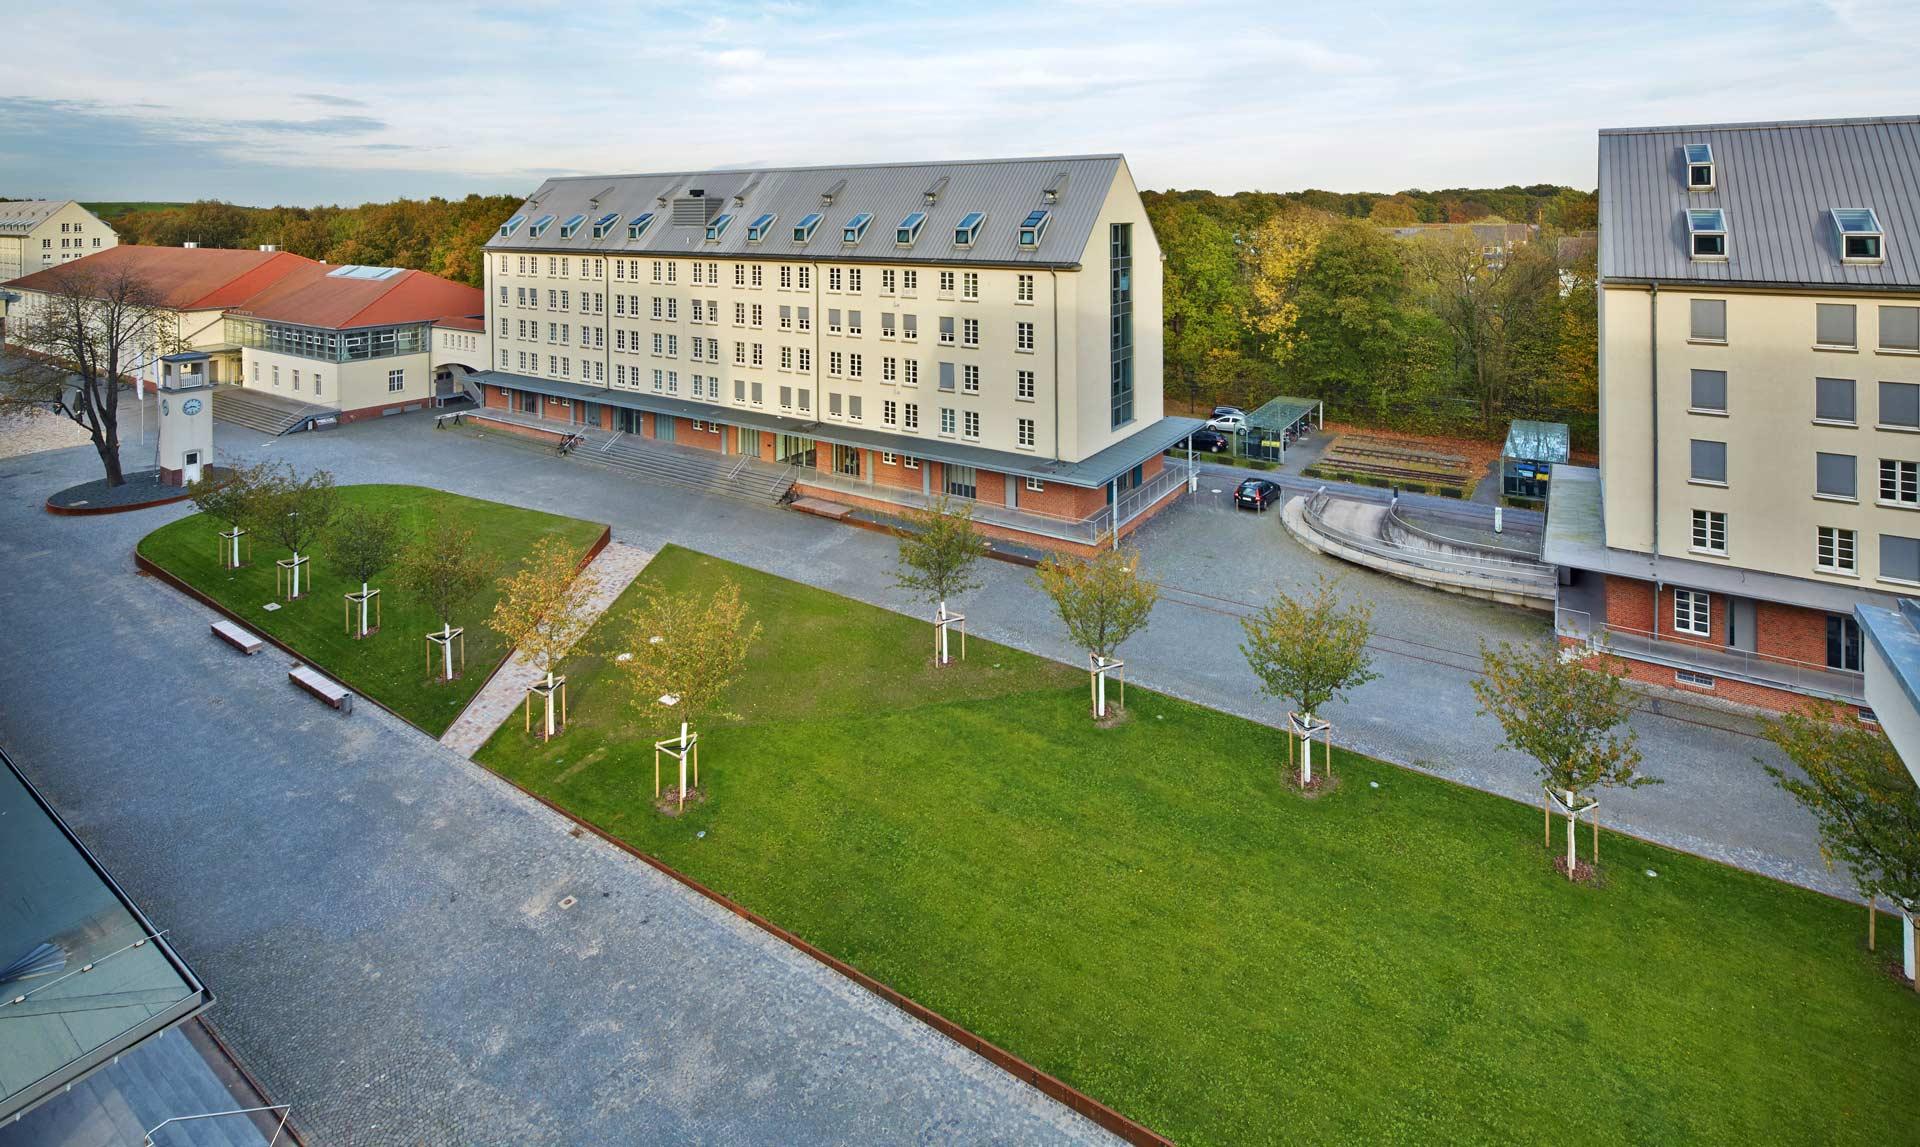 Storehouse City Munster By Scape Landschaftsarchitekten 06 Landscape Architecture Works